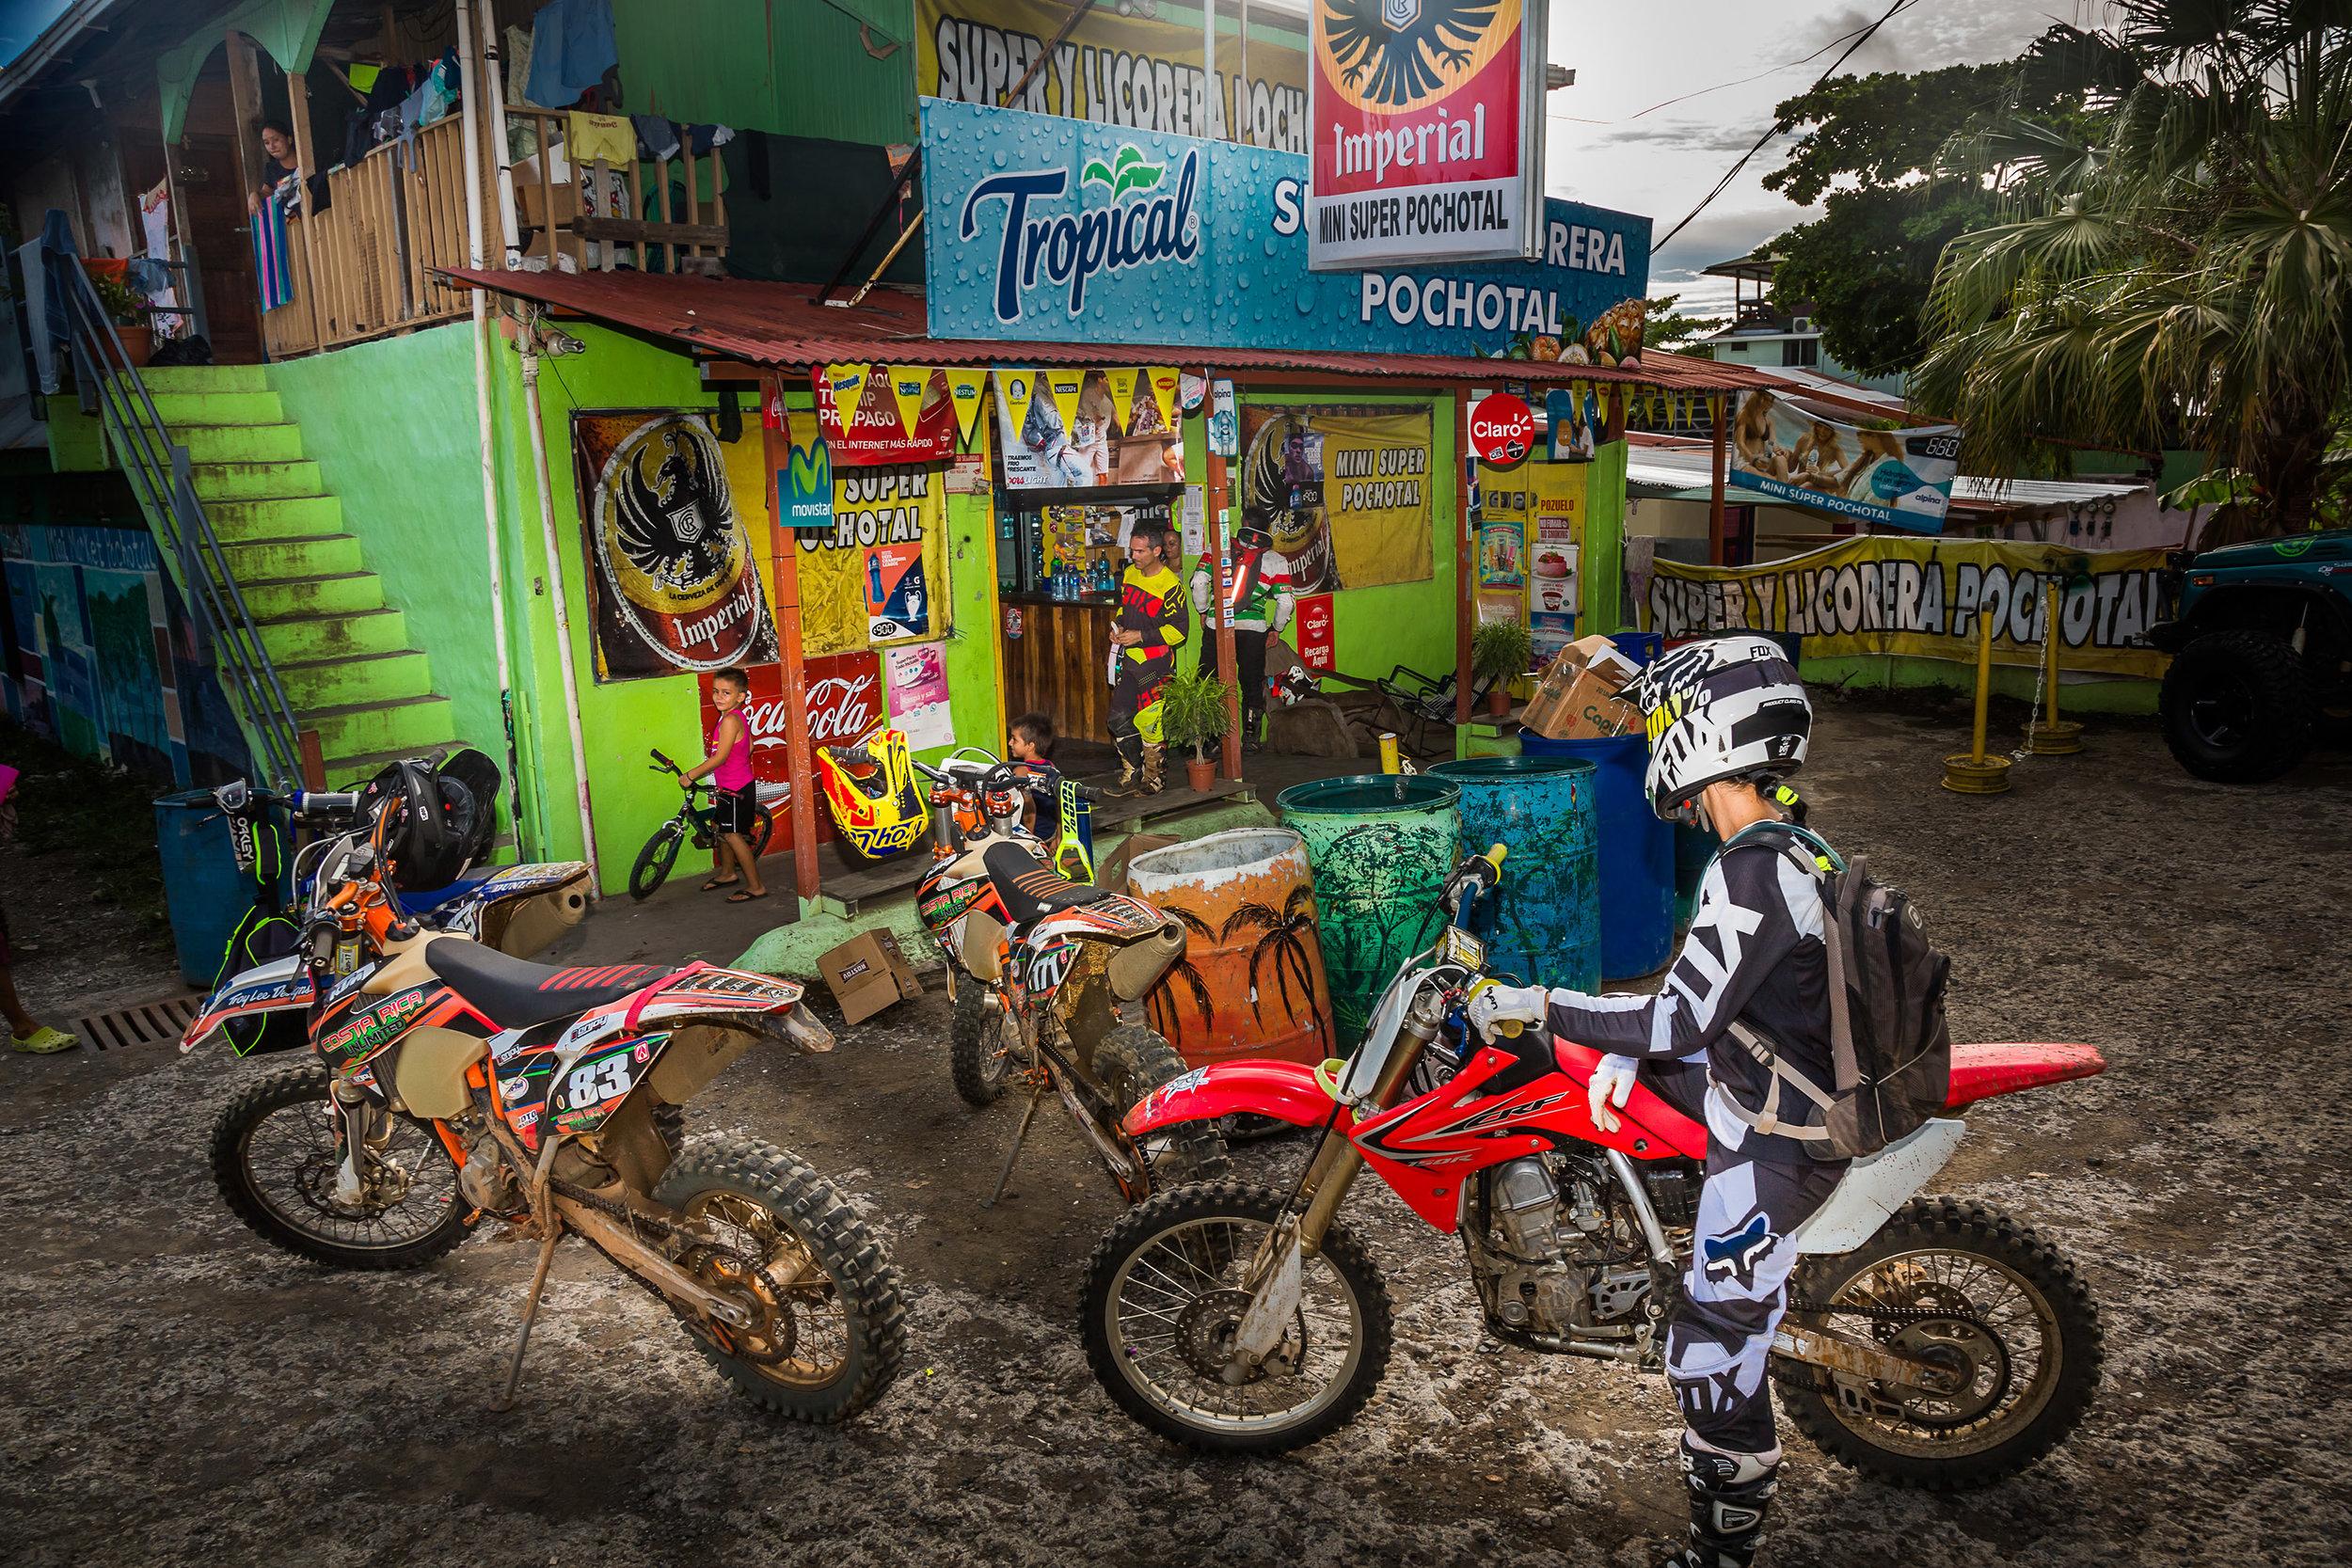 Costa_Rica-ODV_5447.jpg